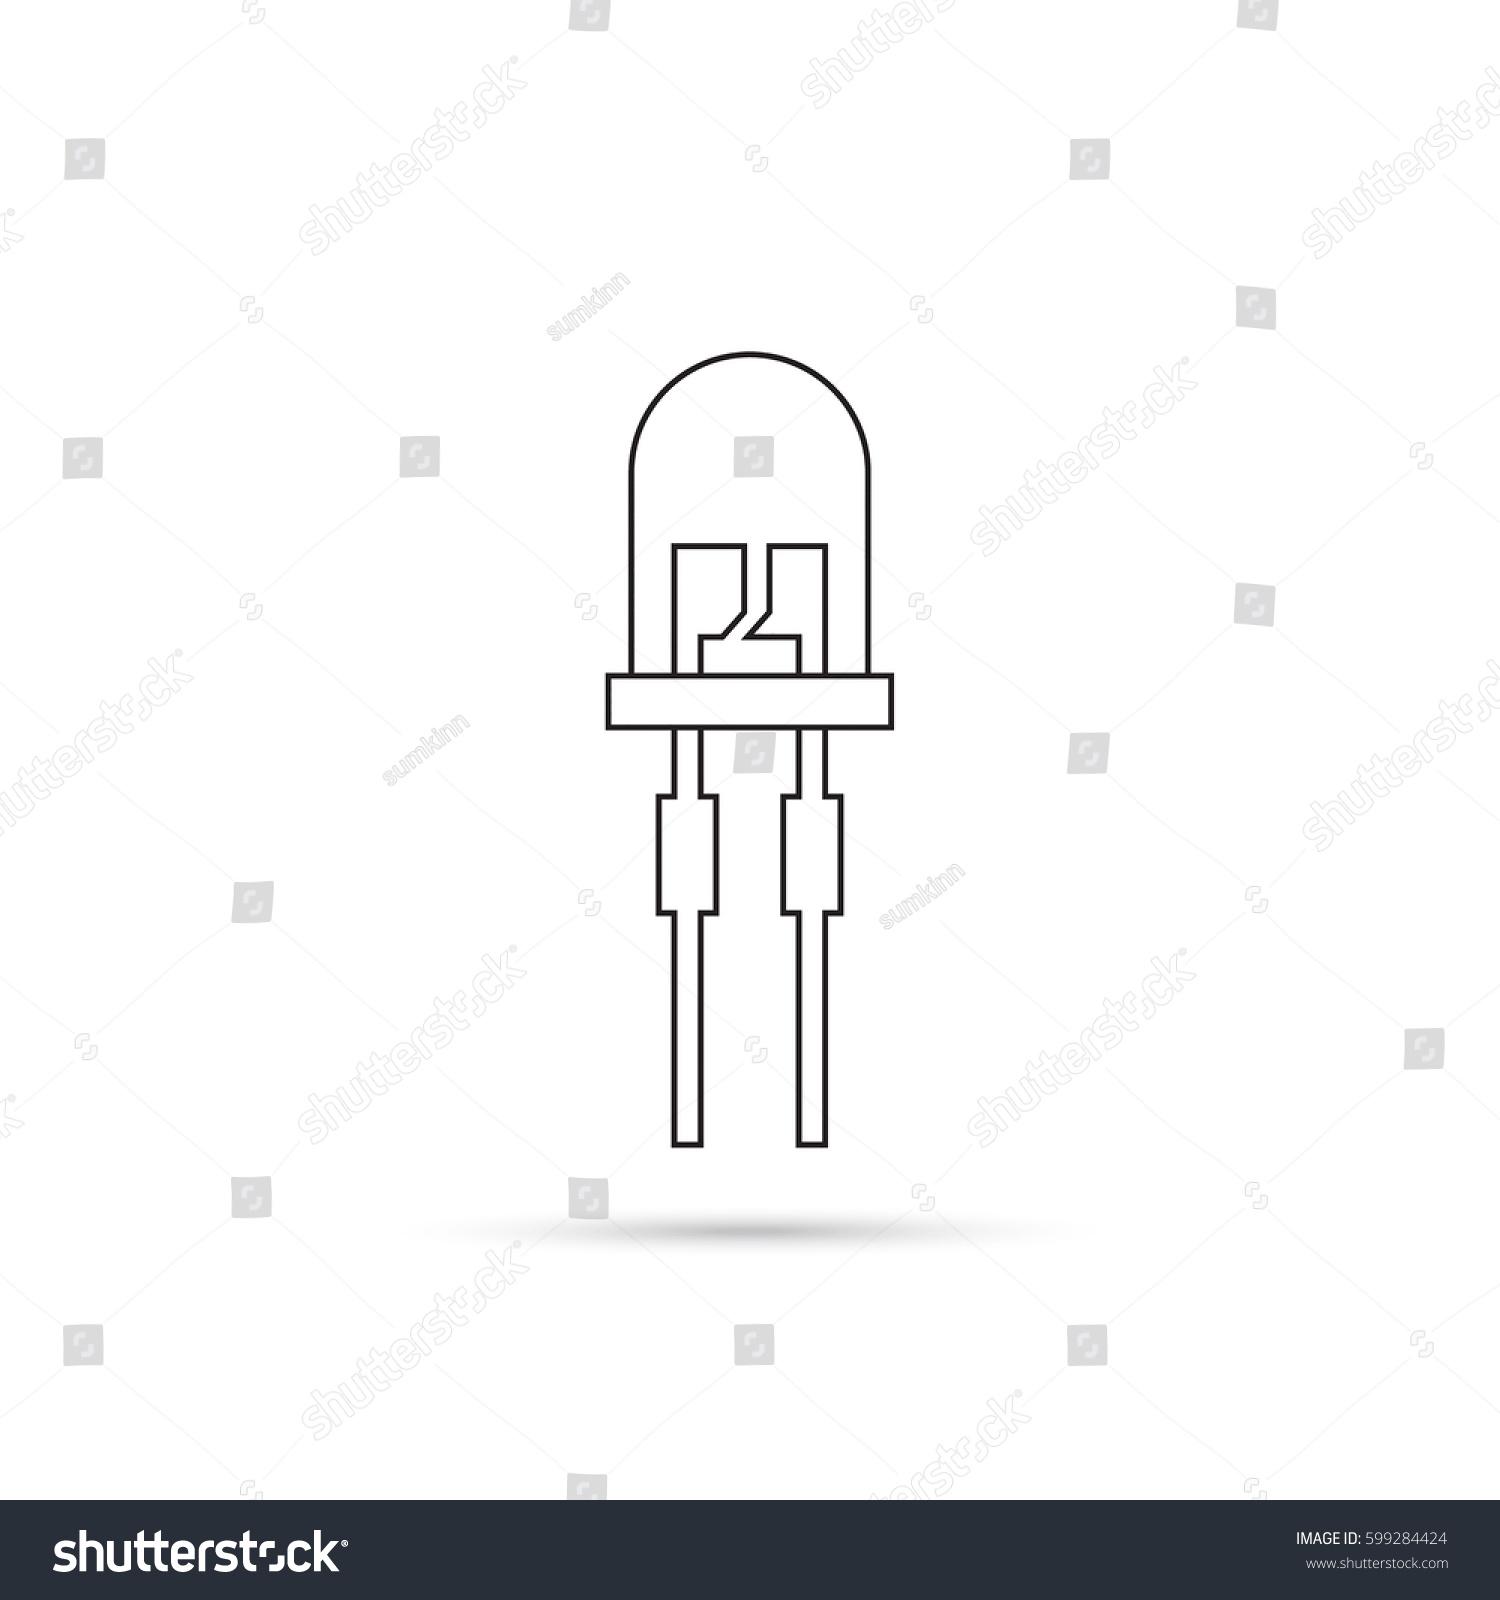 Vector Illustration Lightemitting Diode Led Energy Stock Light Emitting Diagram Of Saving Bulb The Trace Element